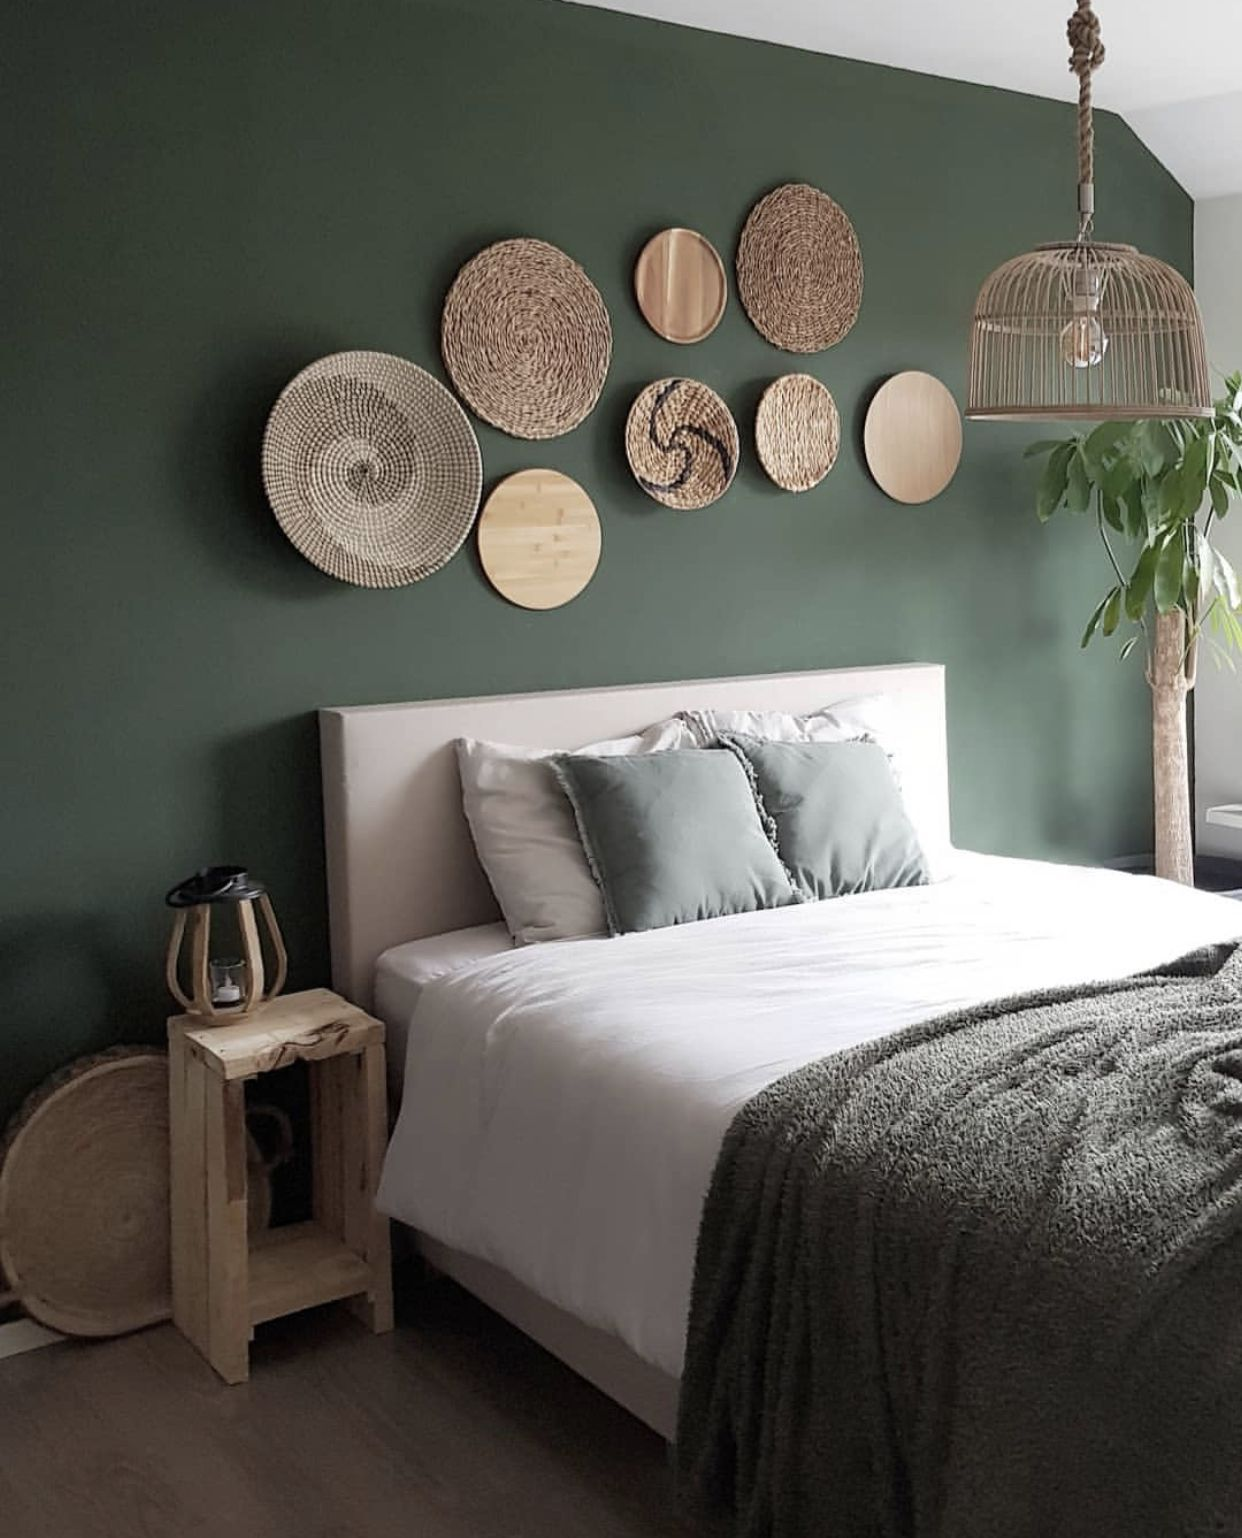 Home decor bedroom, Bedroom interior, Bedroom decor